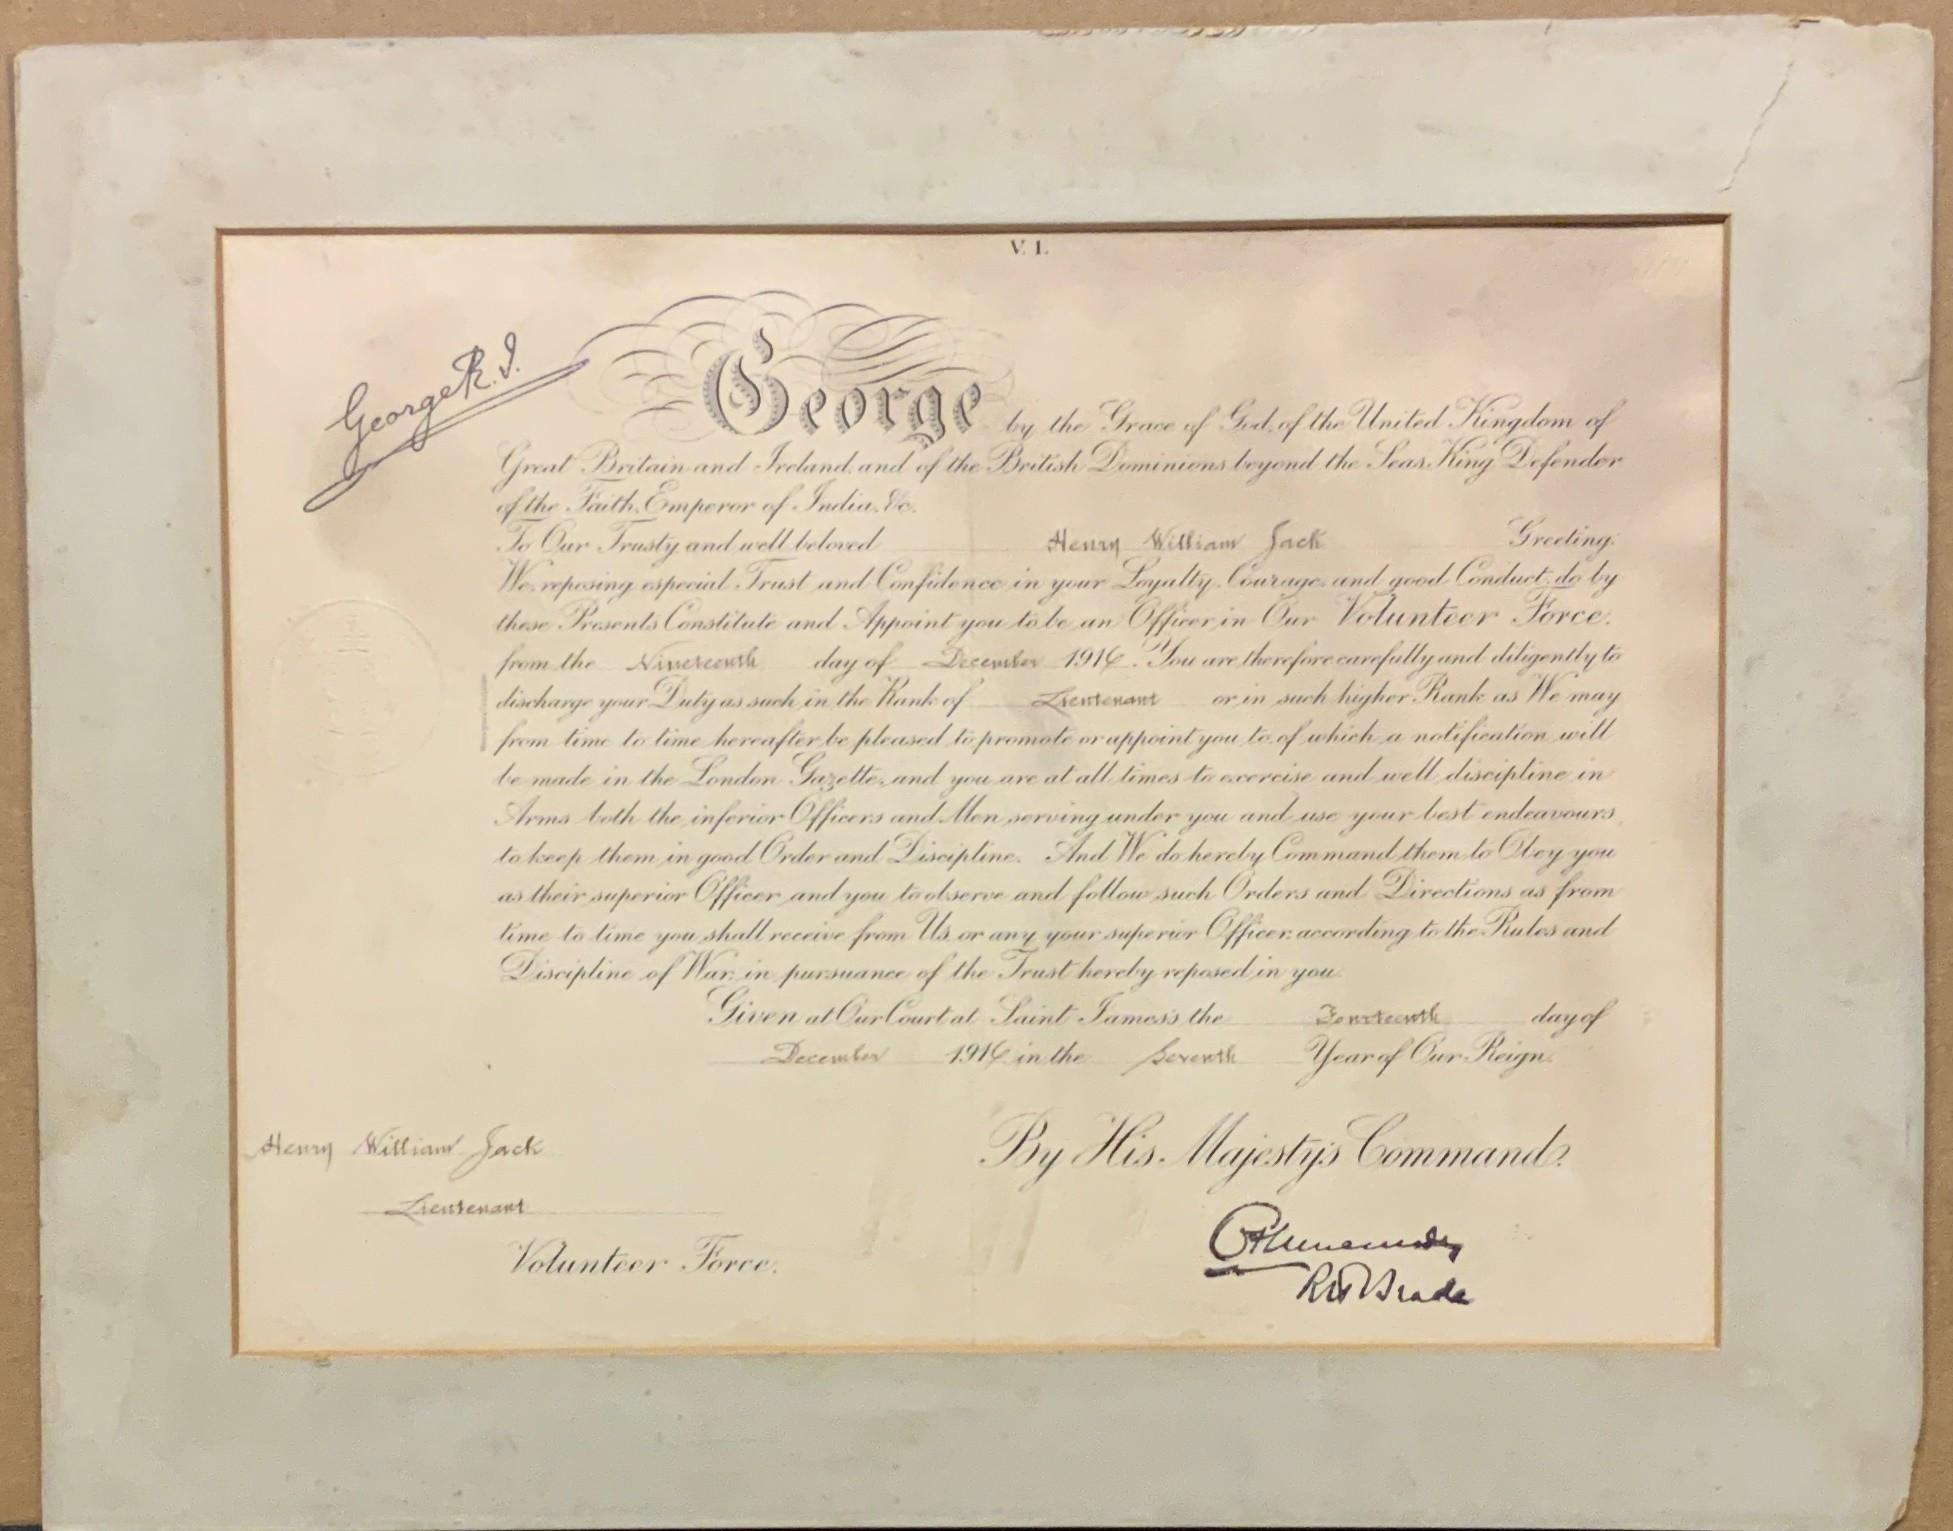 KING GEORGE V MILITARY ORDERS CERTIFICATE TO LIEUTENANT HENRY WILLIAM JACK VOLUNTEER FORCE